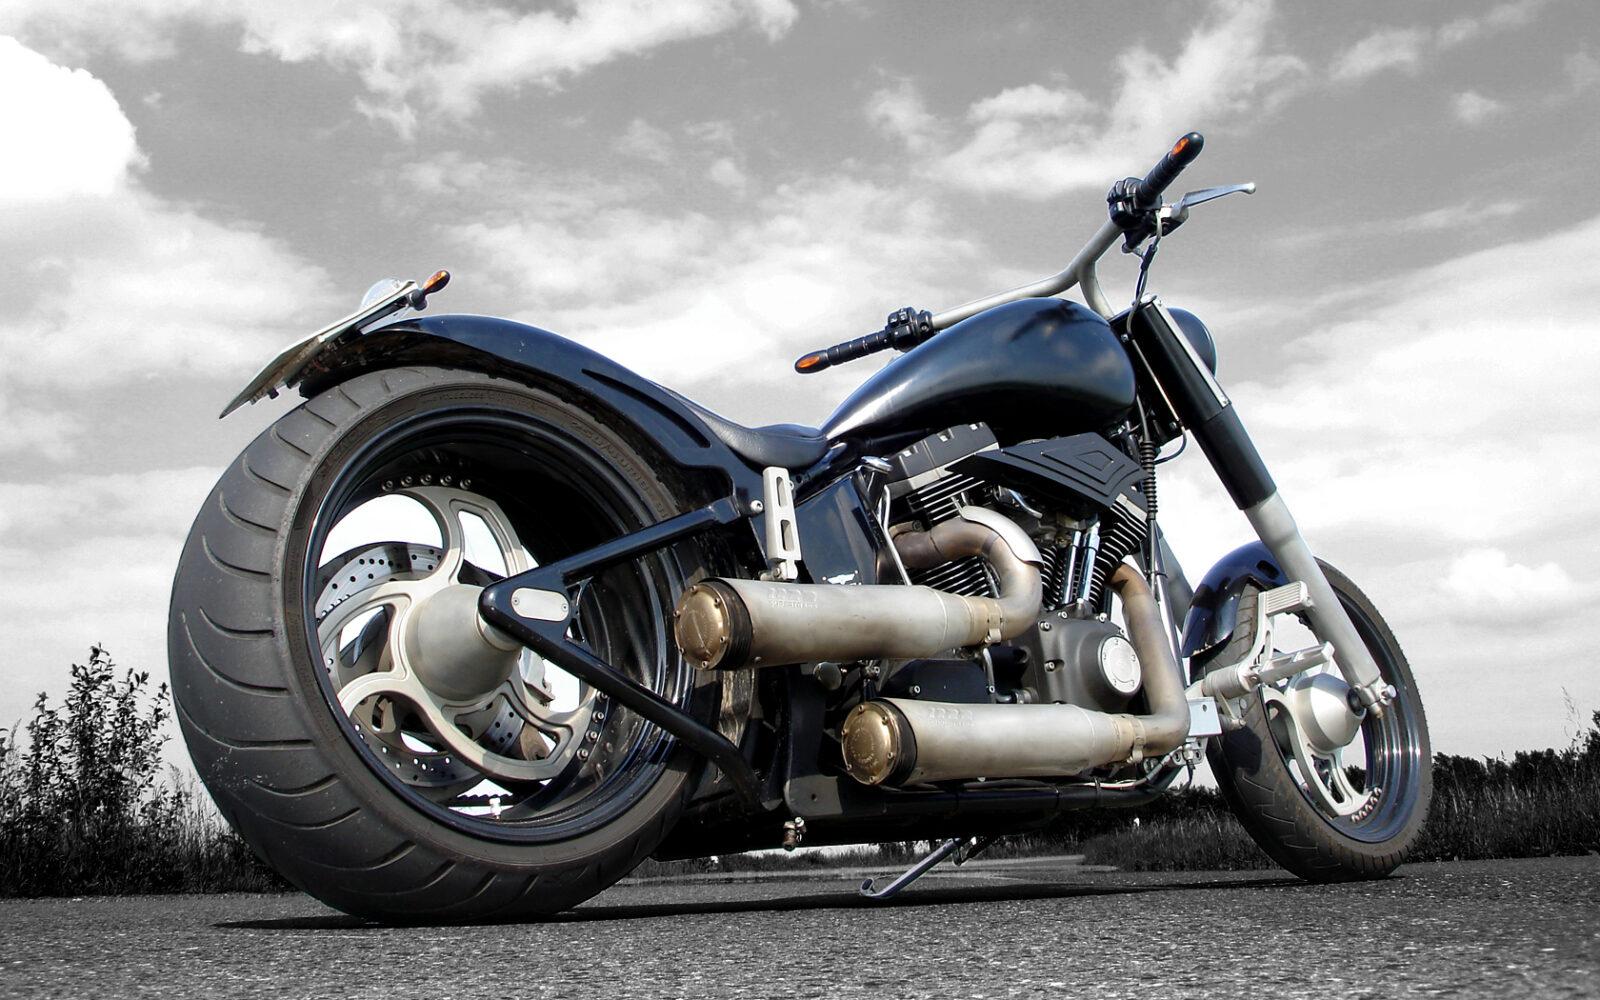 [:de]HD Harley Schubert101 Dresden[:]